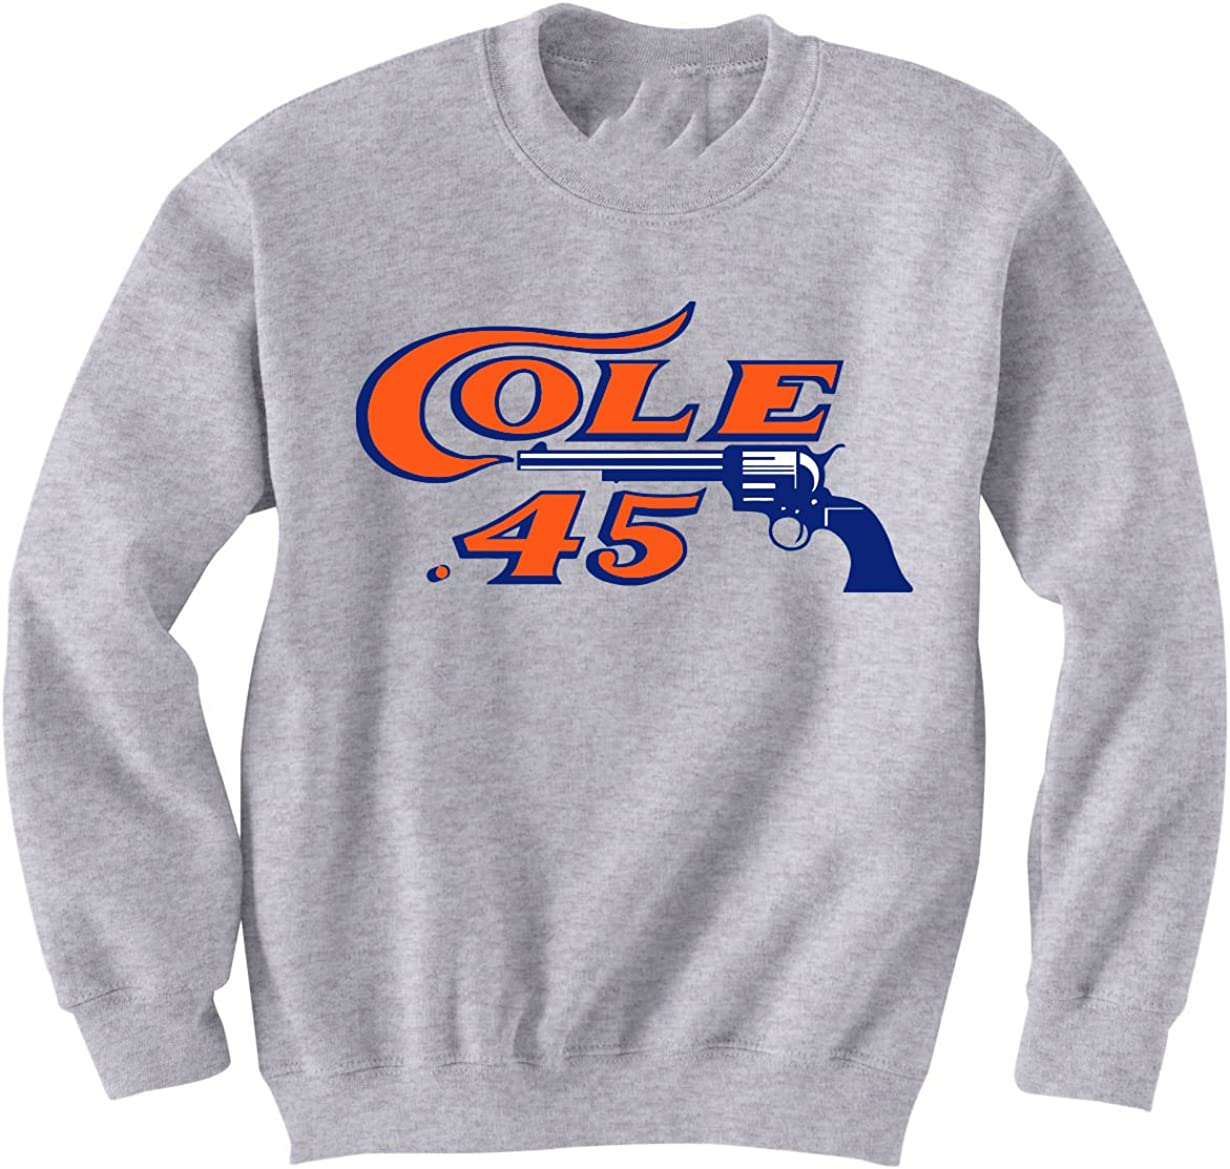 "Gerrit Cole Houston Astros /""Cole 45s/"" HOODED SWEATSHIRT"